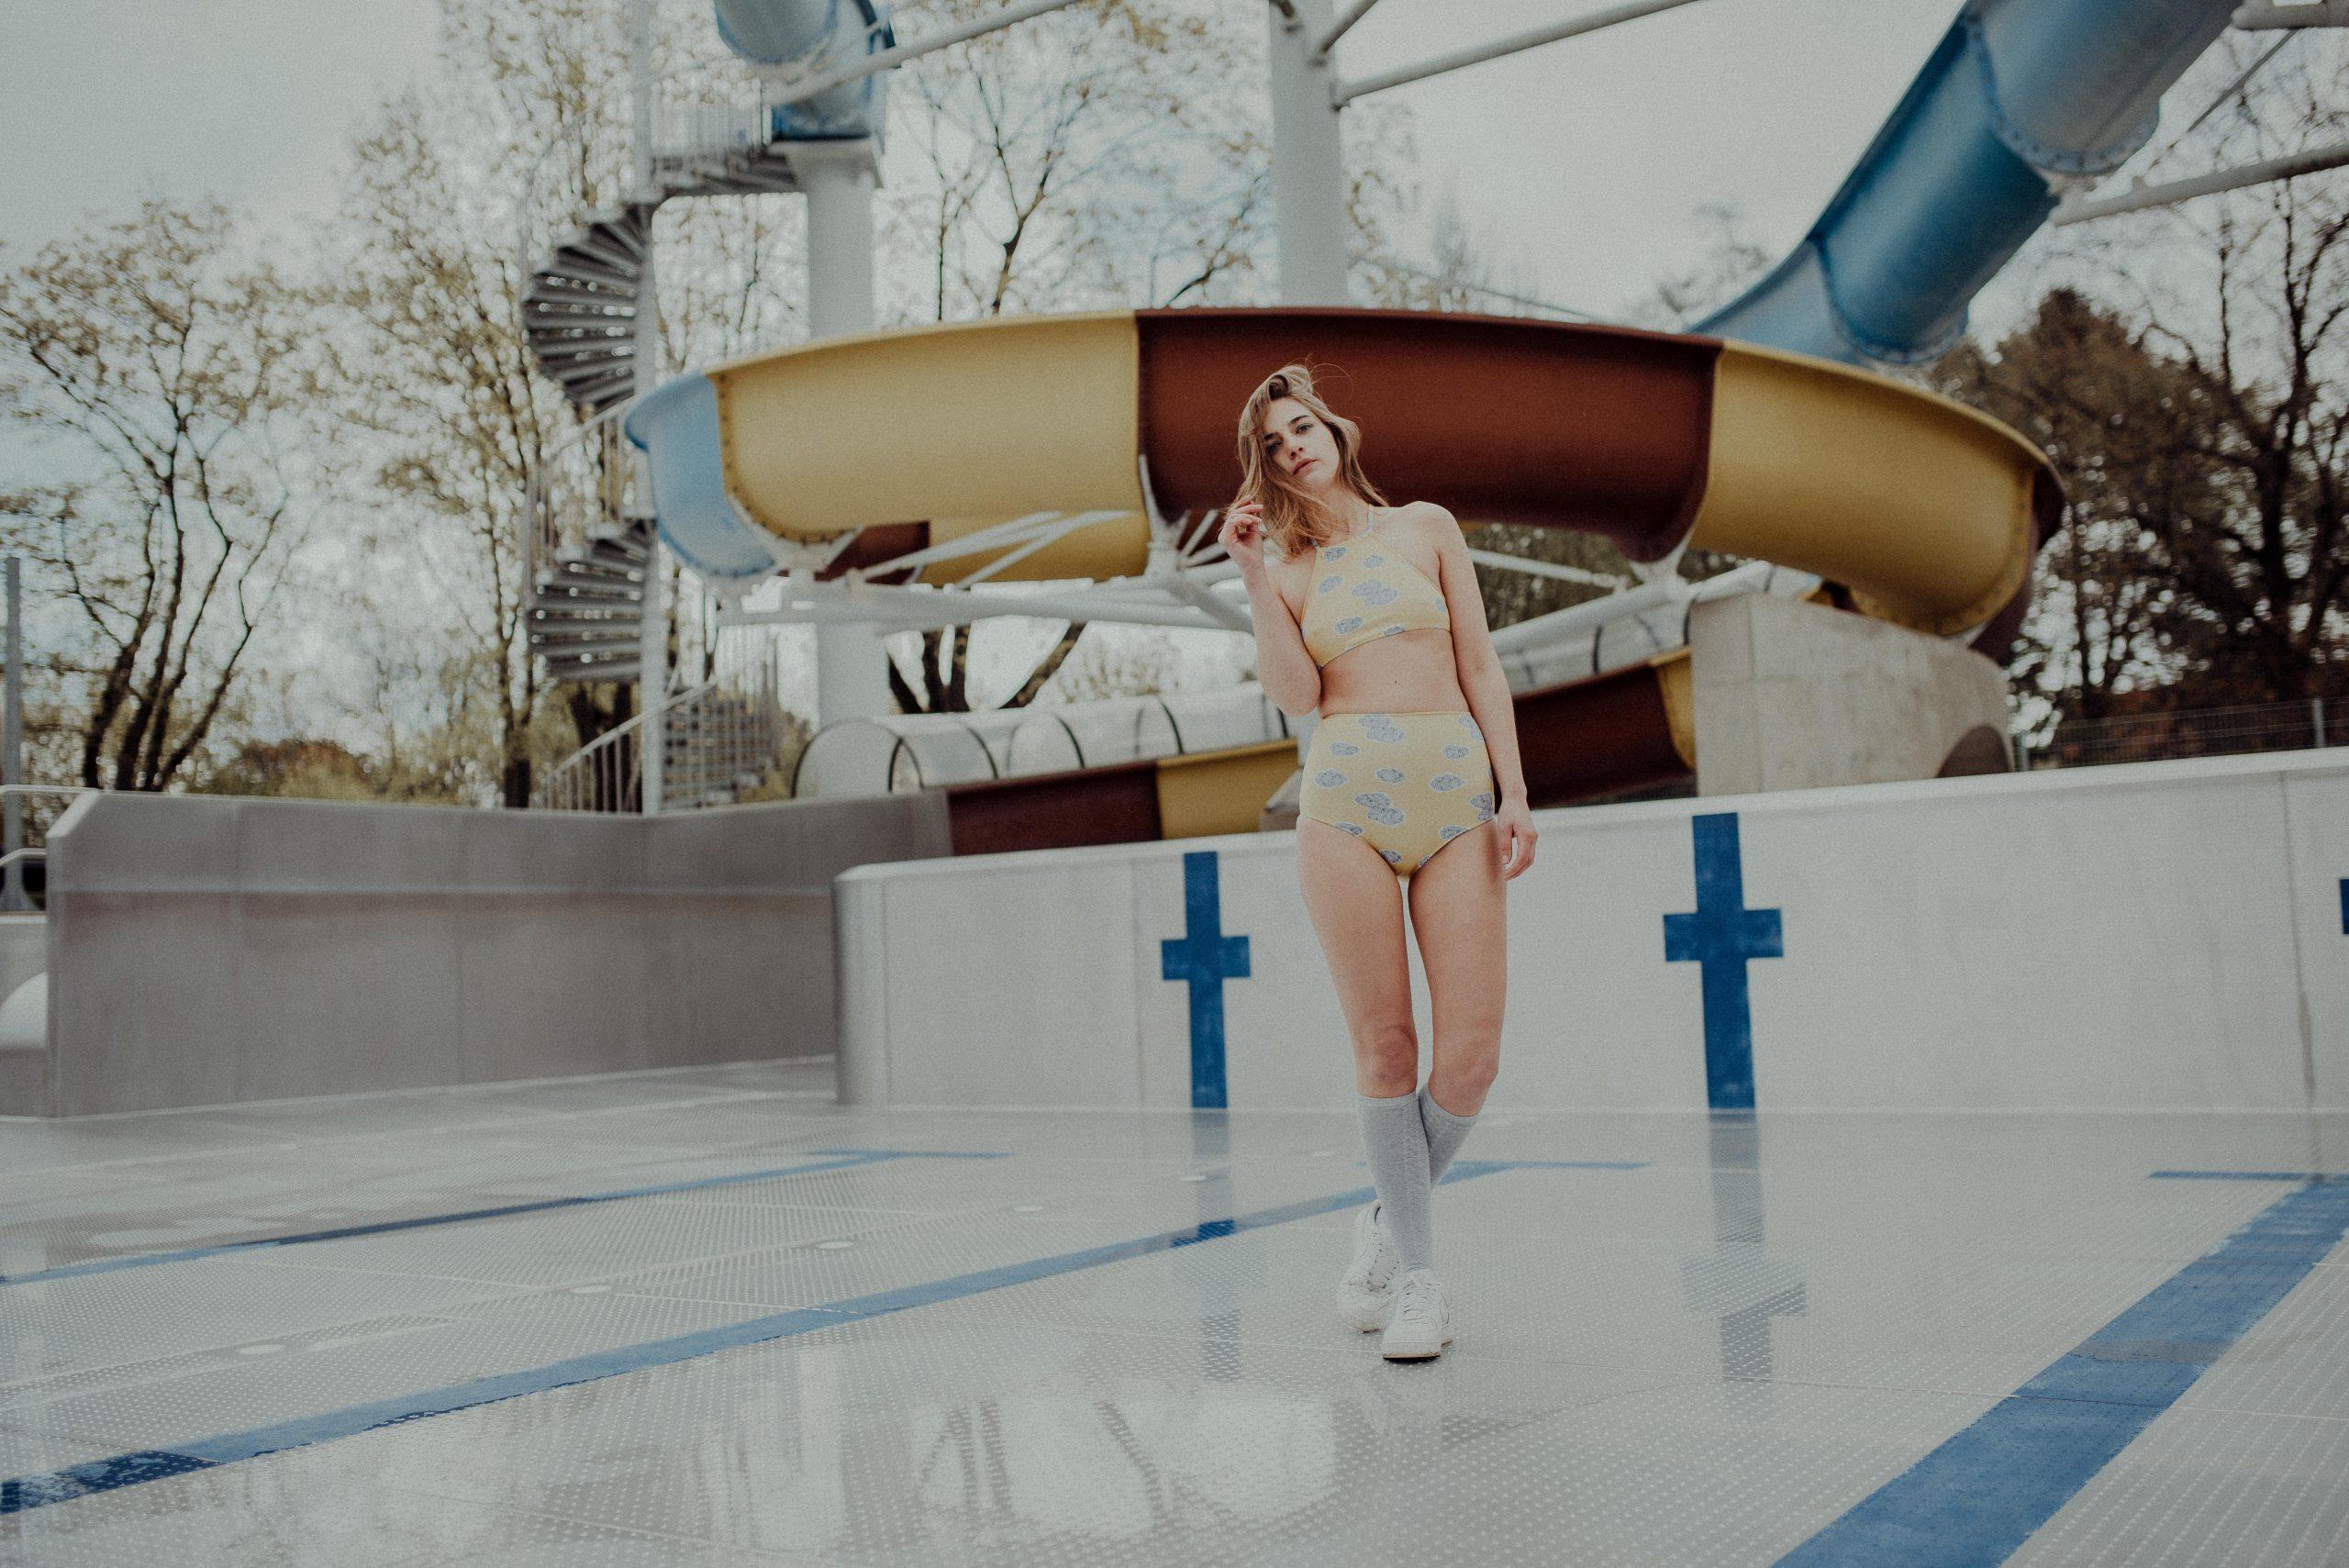 Frau in Badeanzug in leerem Schwimmbecken